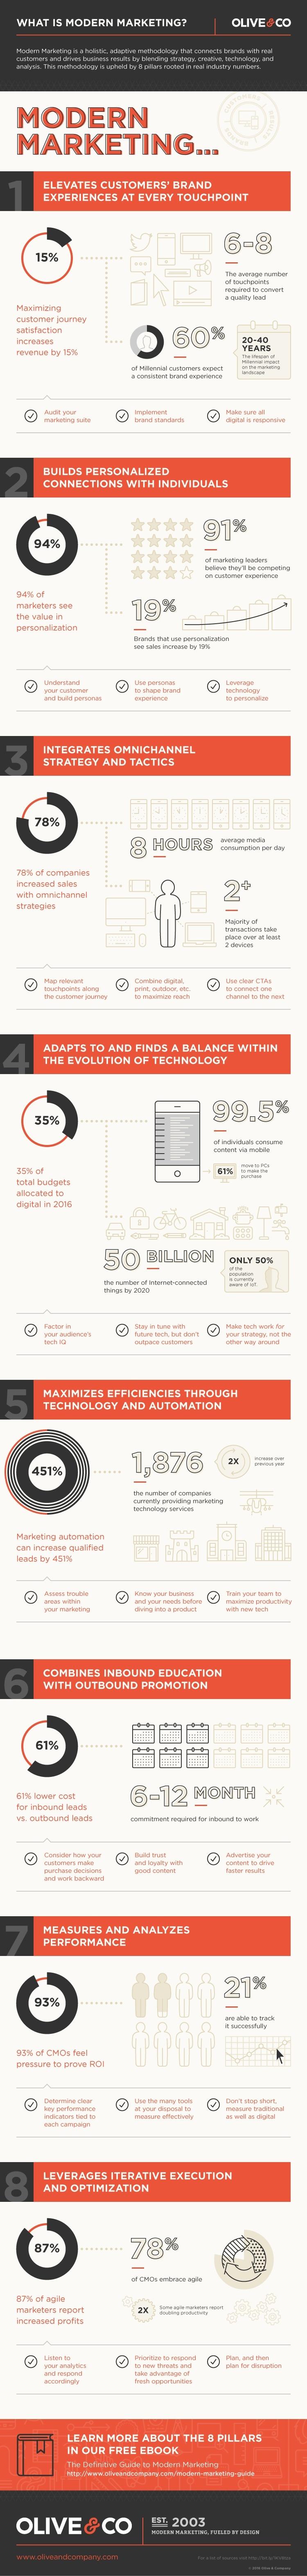 modern-marketing-infographic